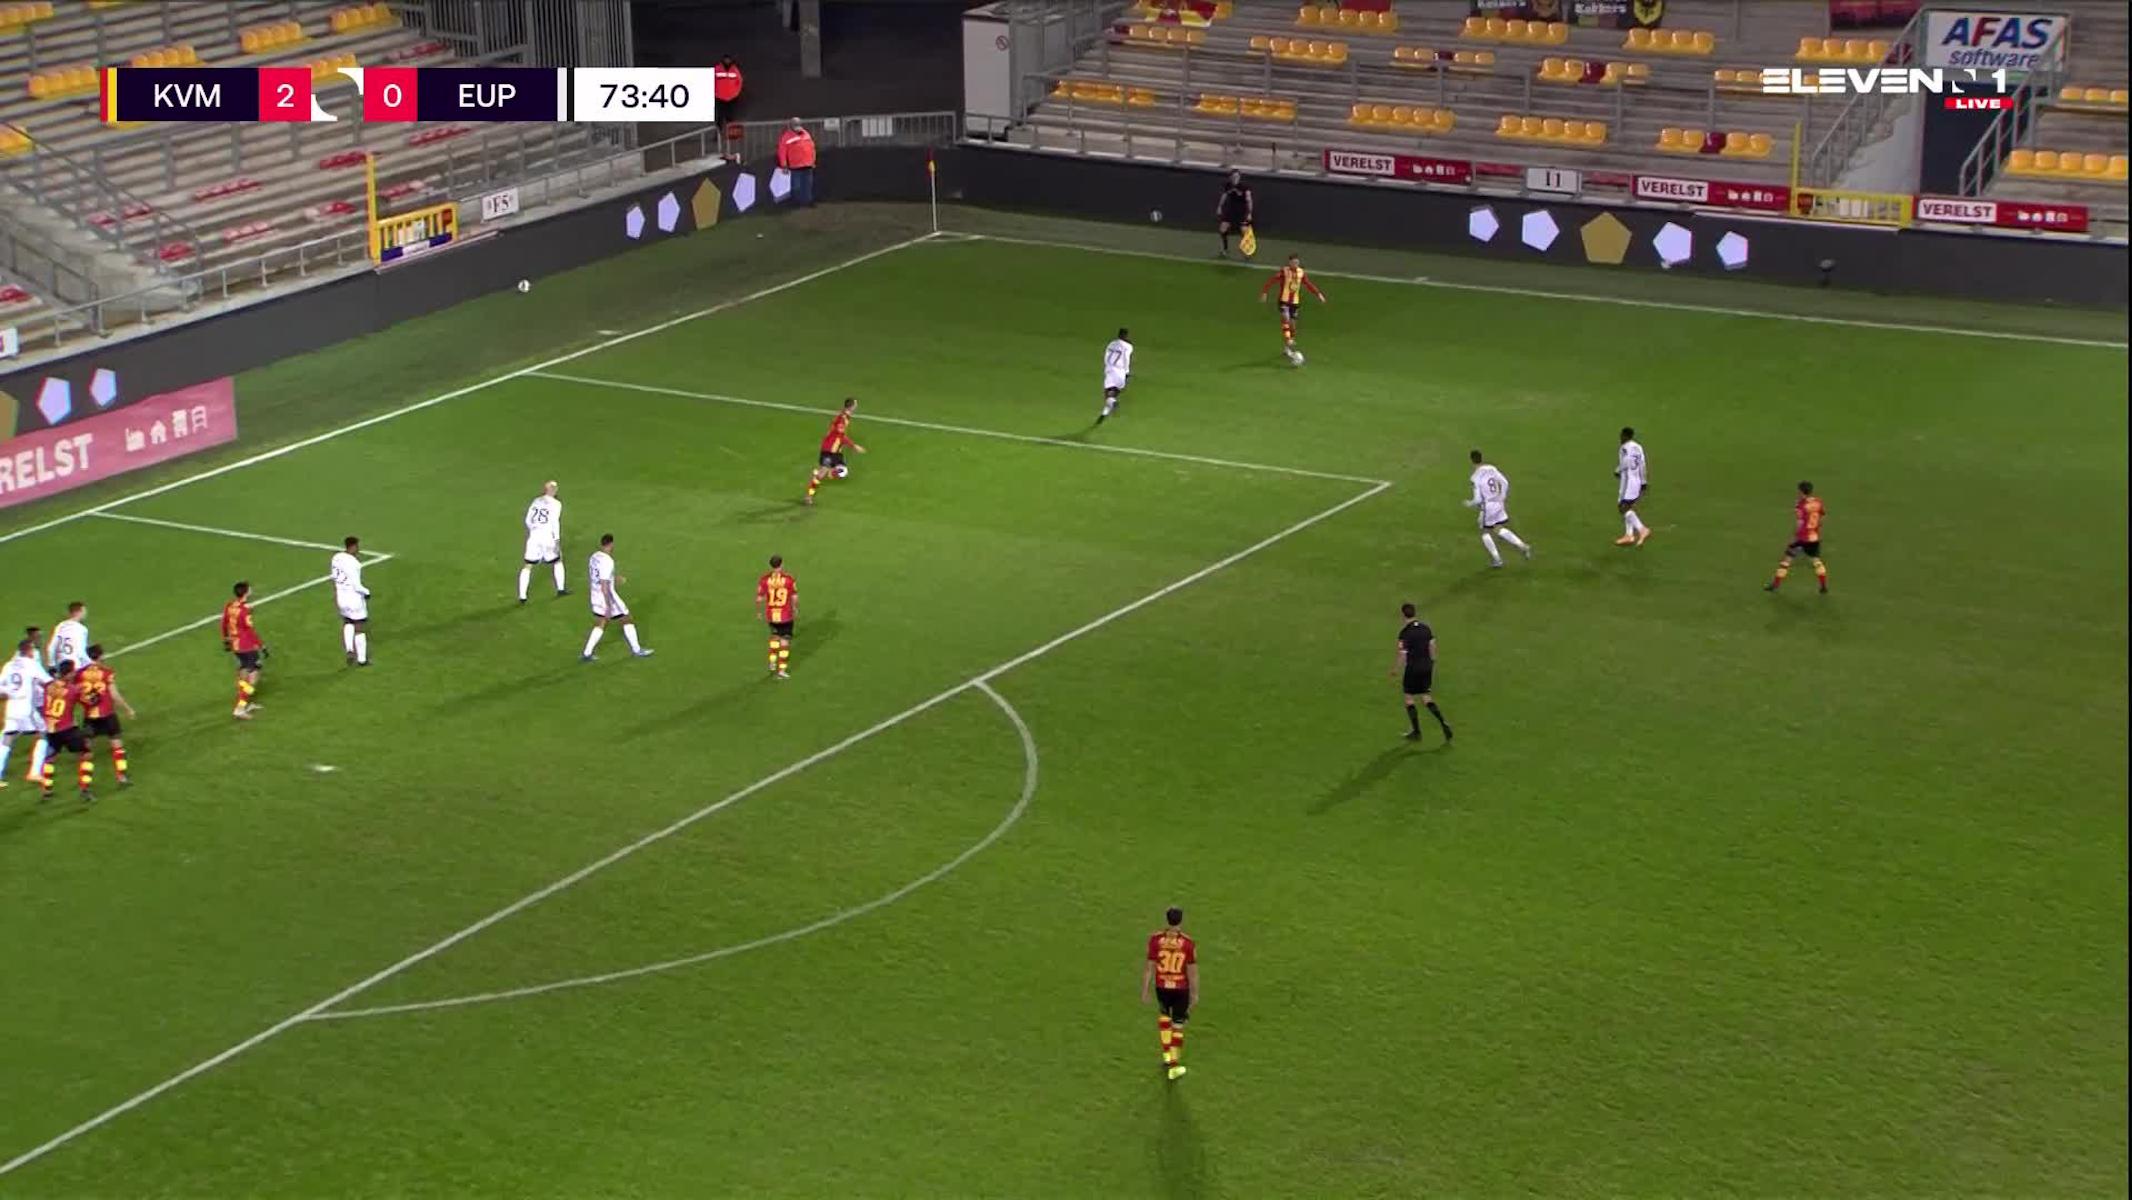 Doelpunt Igor Alberto Rinck de Camargo (KV Mechelen vs. KAS Eupen)